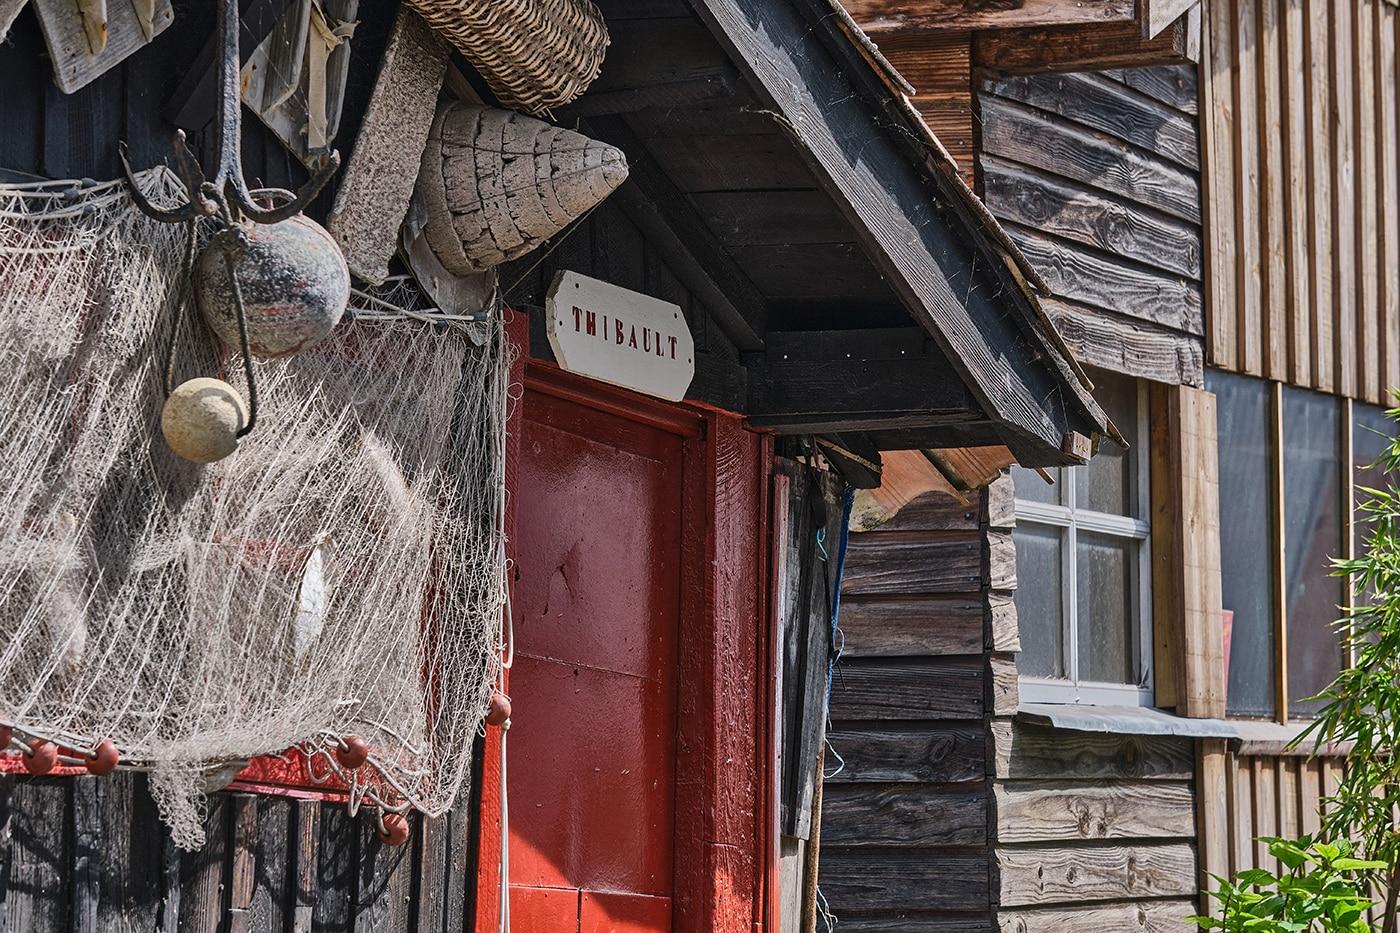 cabane village de lherbe cap ferret road trip bassin d'arcachon